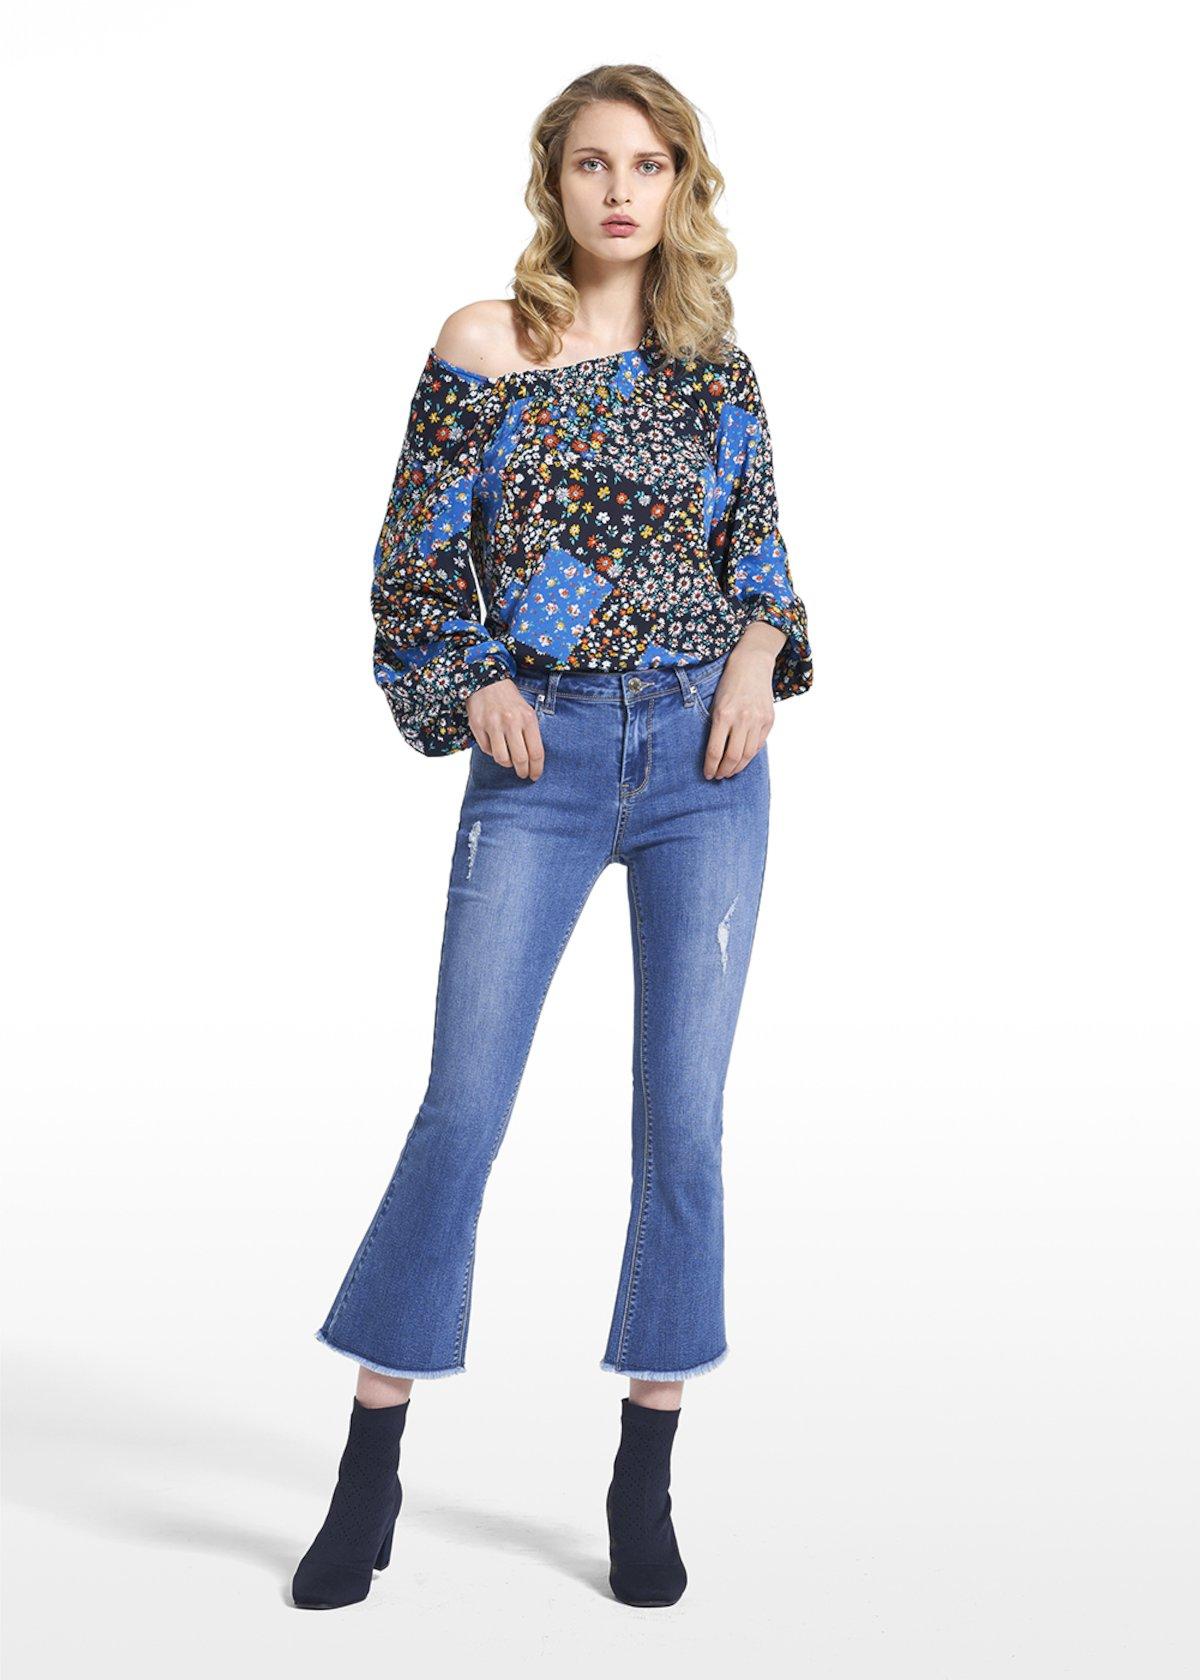 5-pocket flared pants Pandy - Blue - Woman - Category image